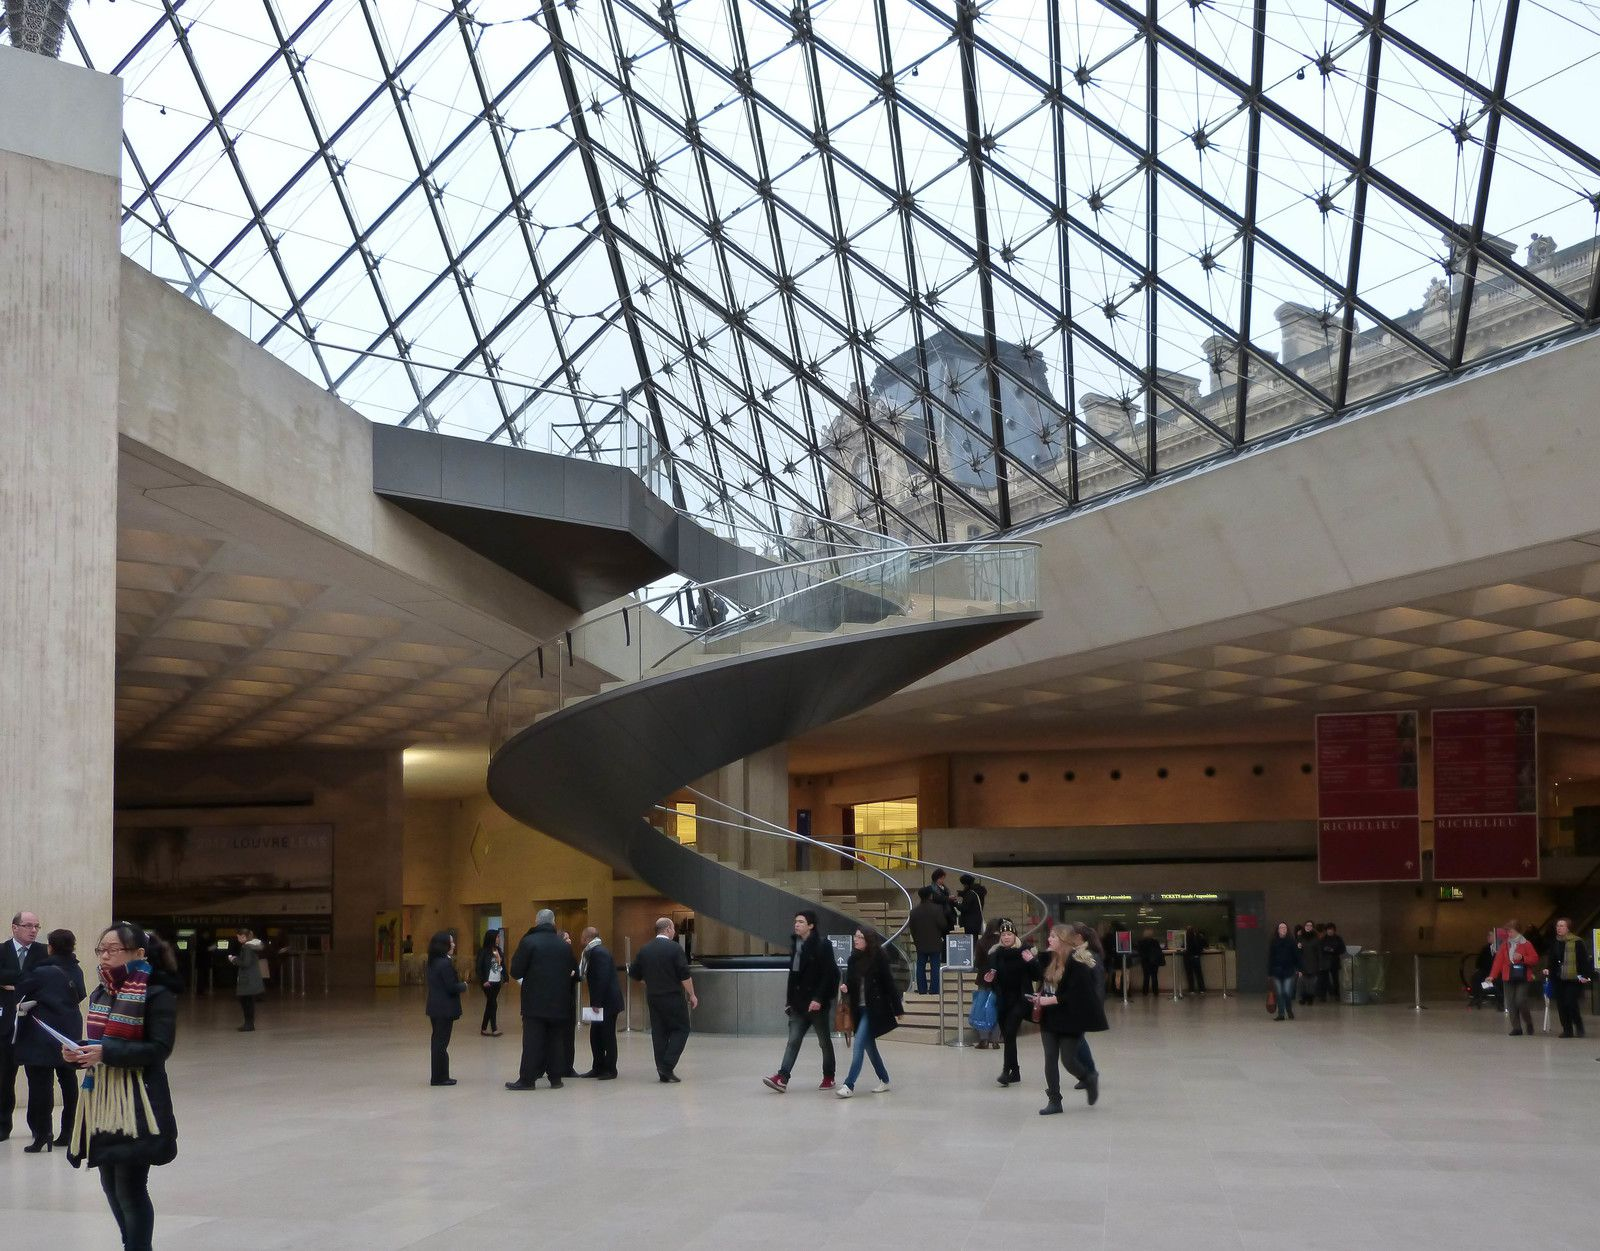 Devinette du samedi 18 avril 2020 - Suite - La pyramide du Louvre